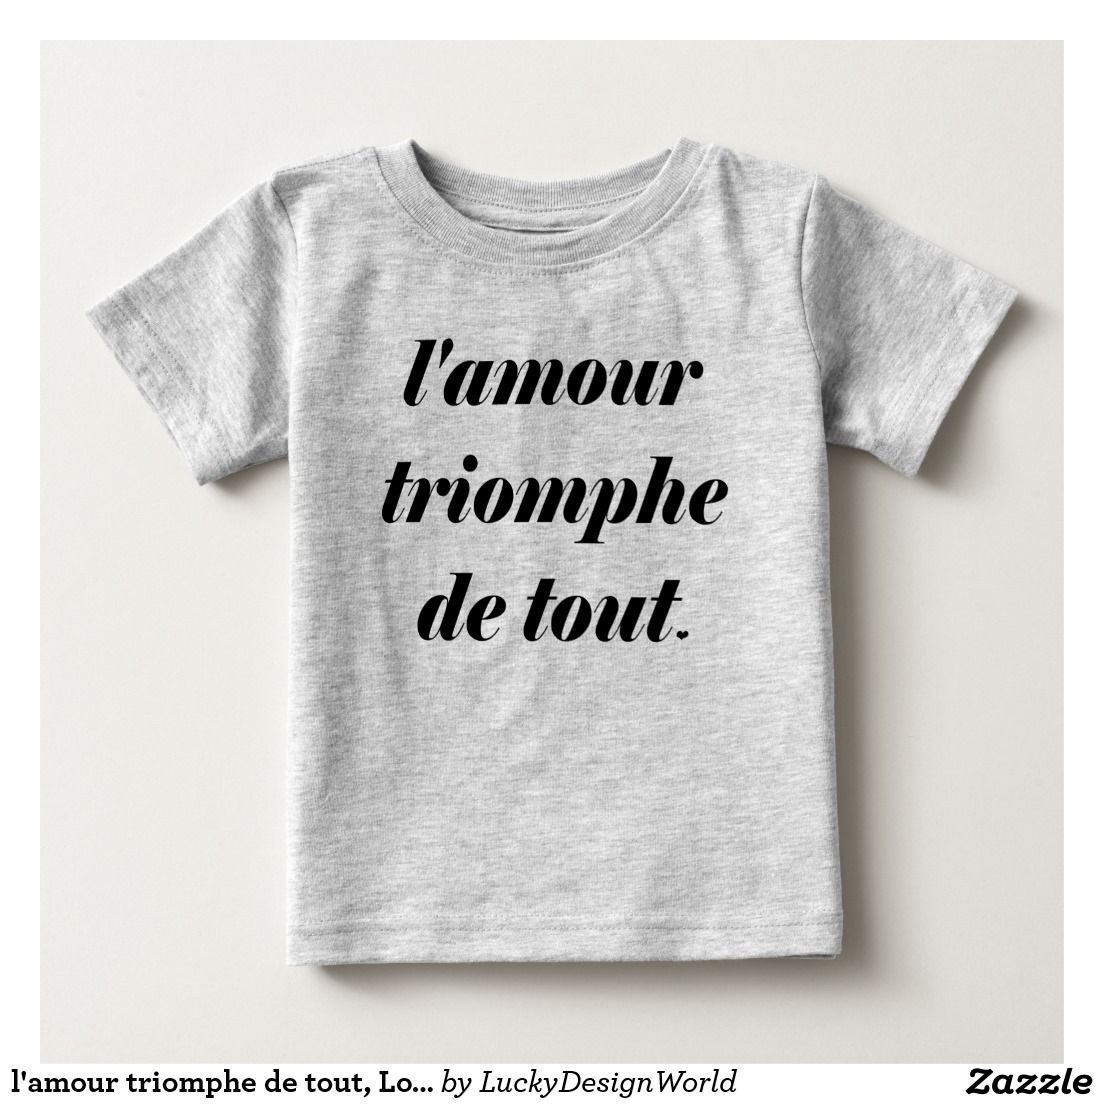 Design t shirt zazzle - L Amour Triomphe De Tout Love Conquers All Baby T Shirt This Design Features A French Inspirational Quote L Amour Triomphe De Tout With A Little Heart As